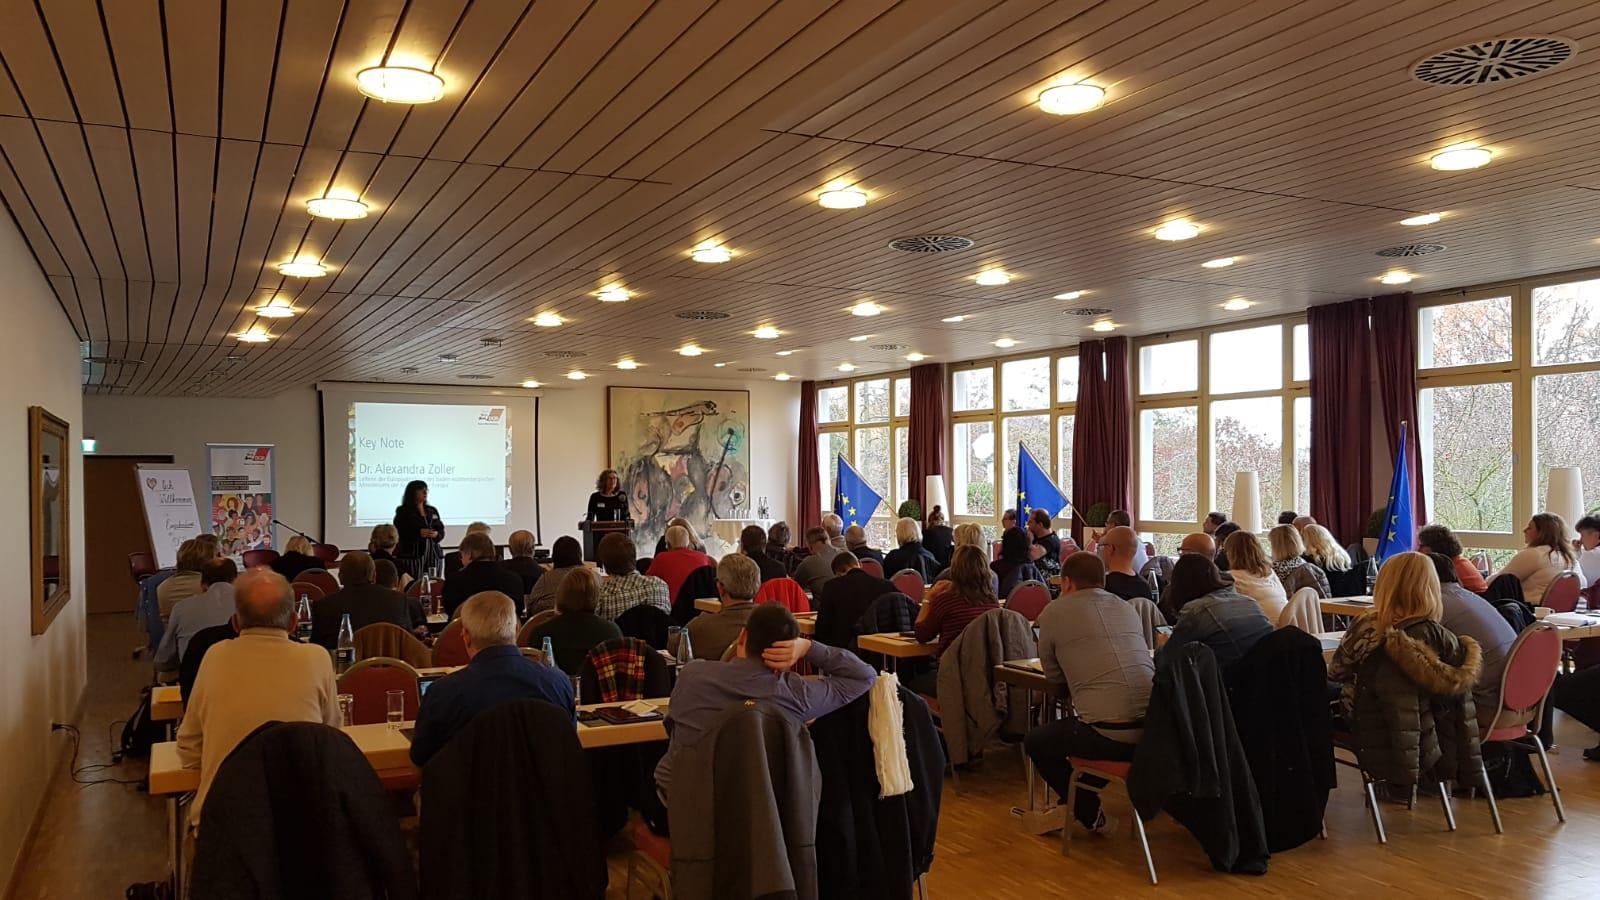 Europa-Konferenz DGB Baden-Württemberg, 15.11.2018 in Durbach